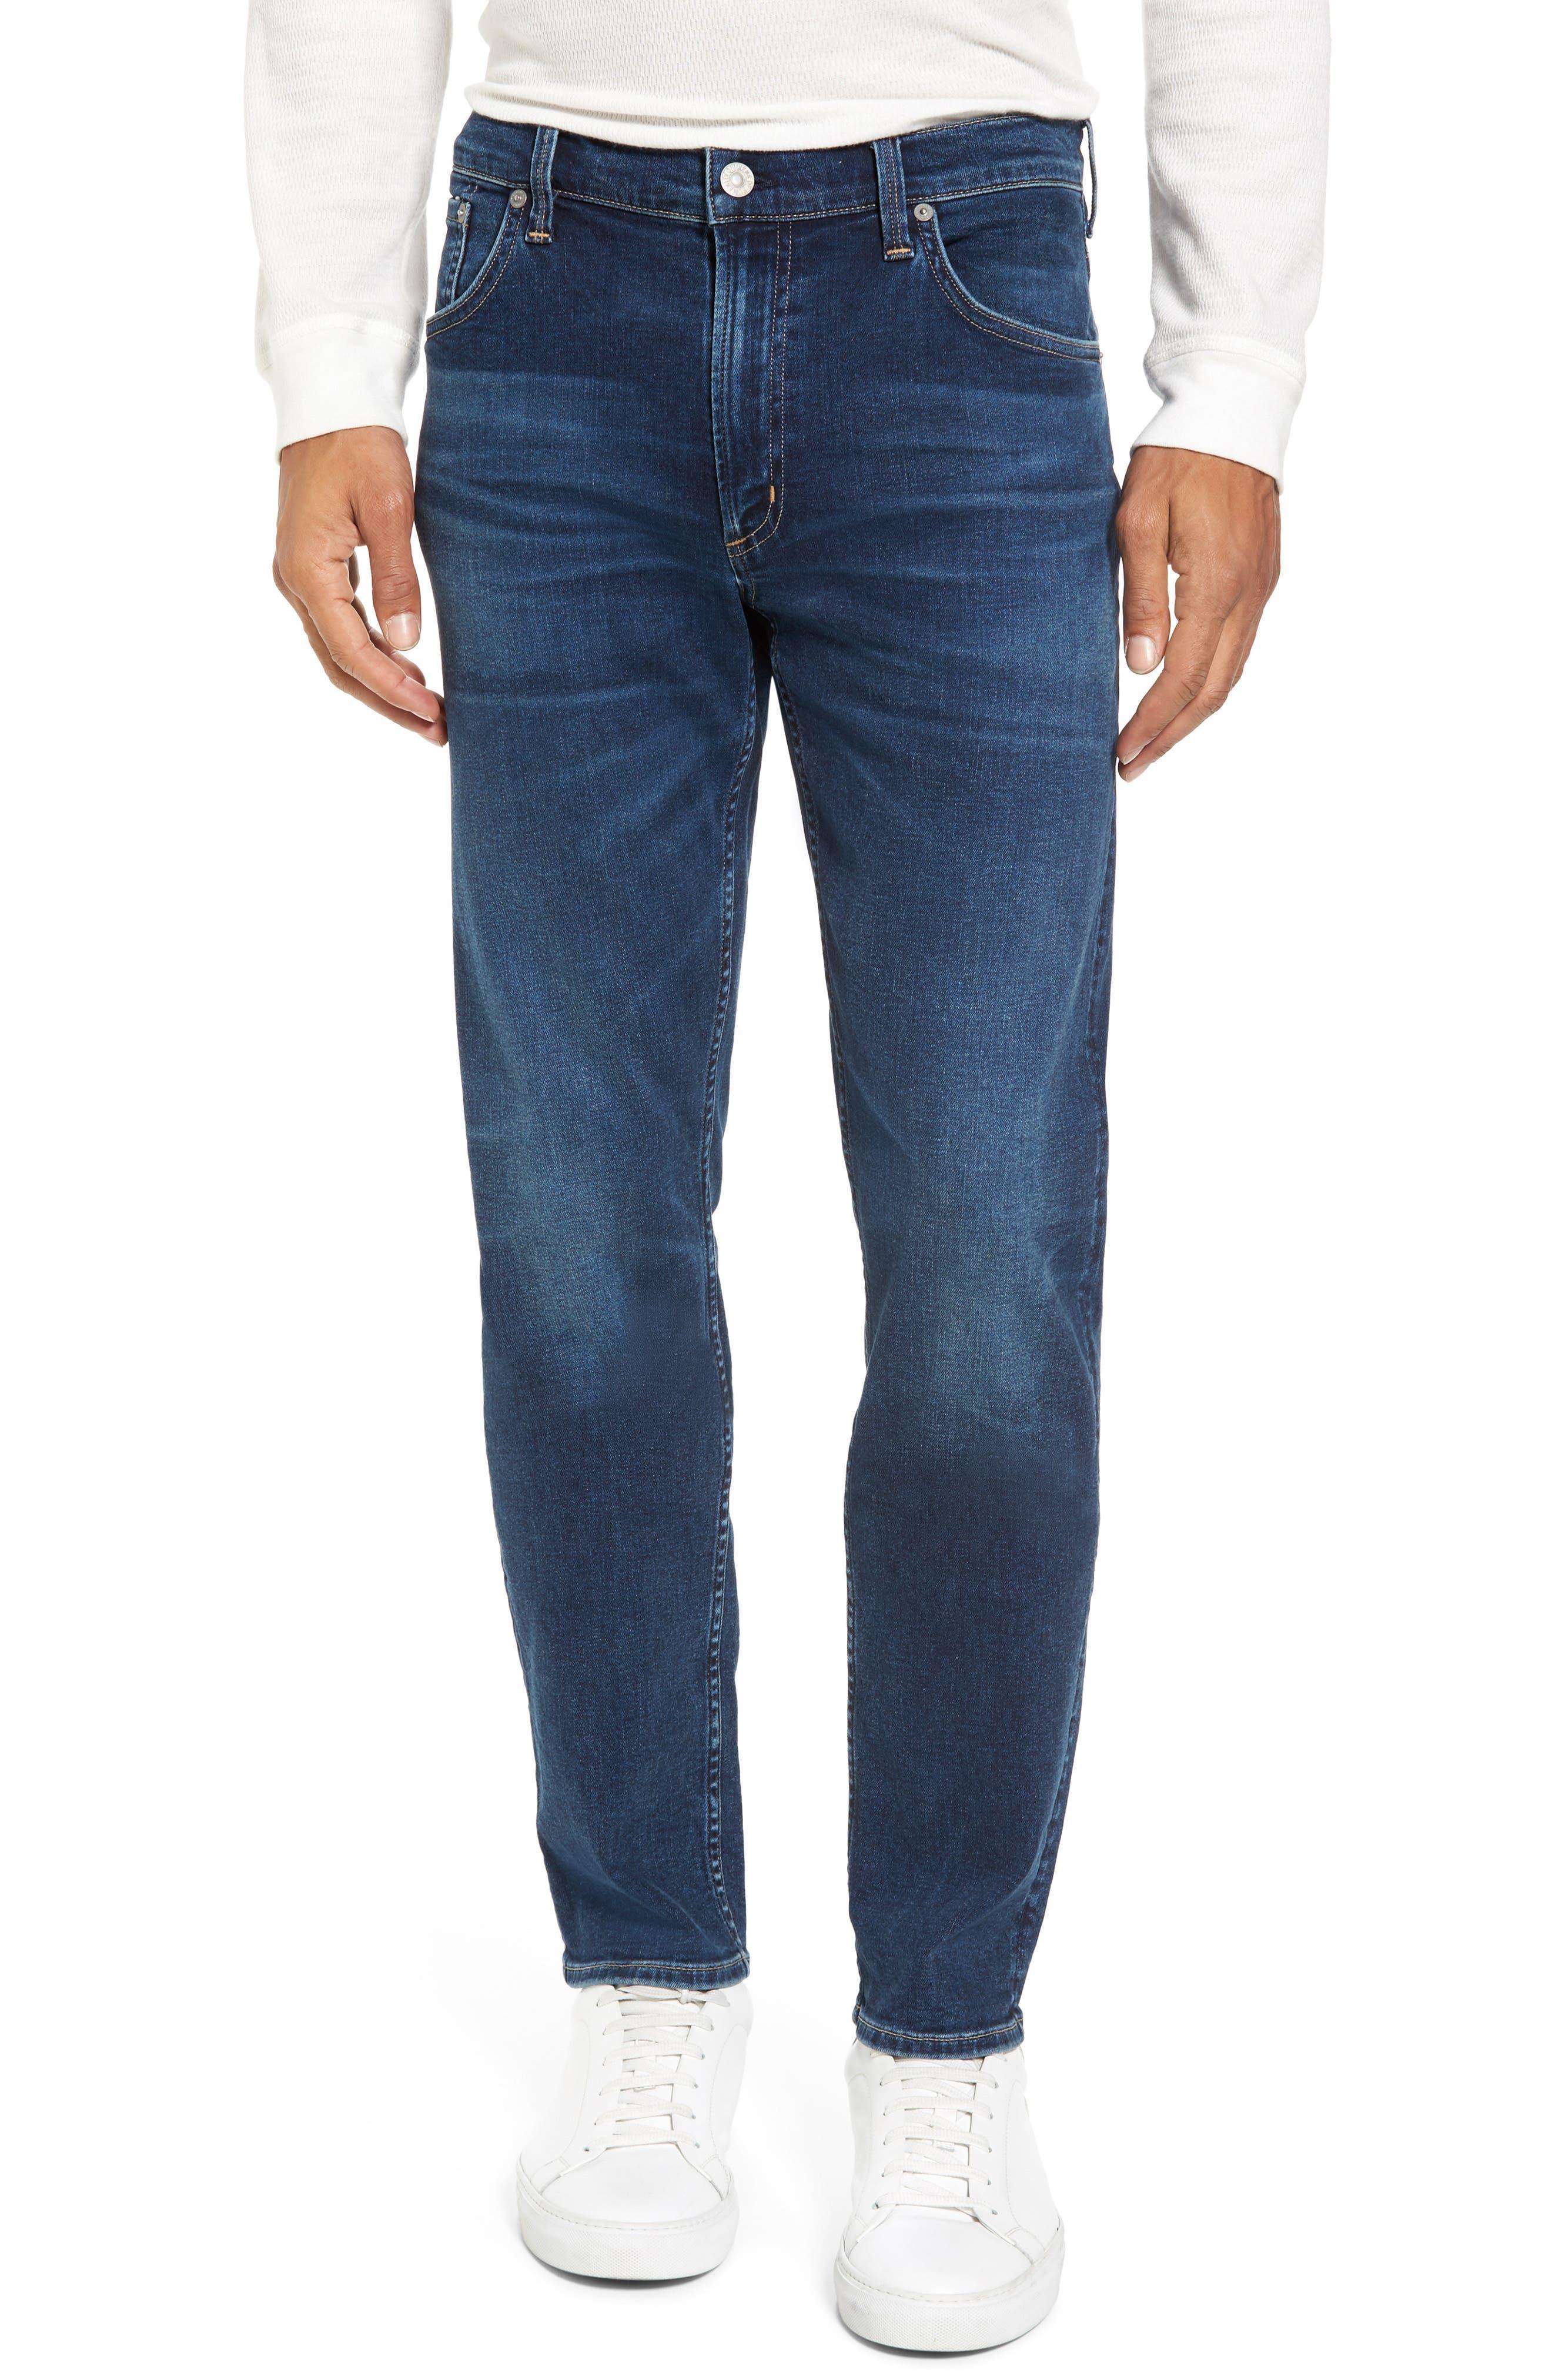 PERFORM - Gage Slim Straight Leg Jeans,                         Main,                         color, Turner